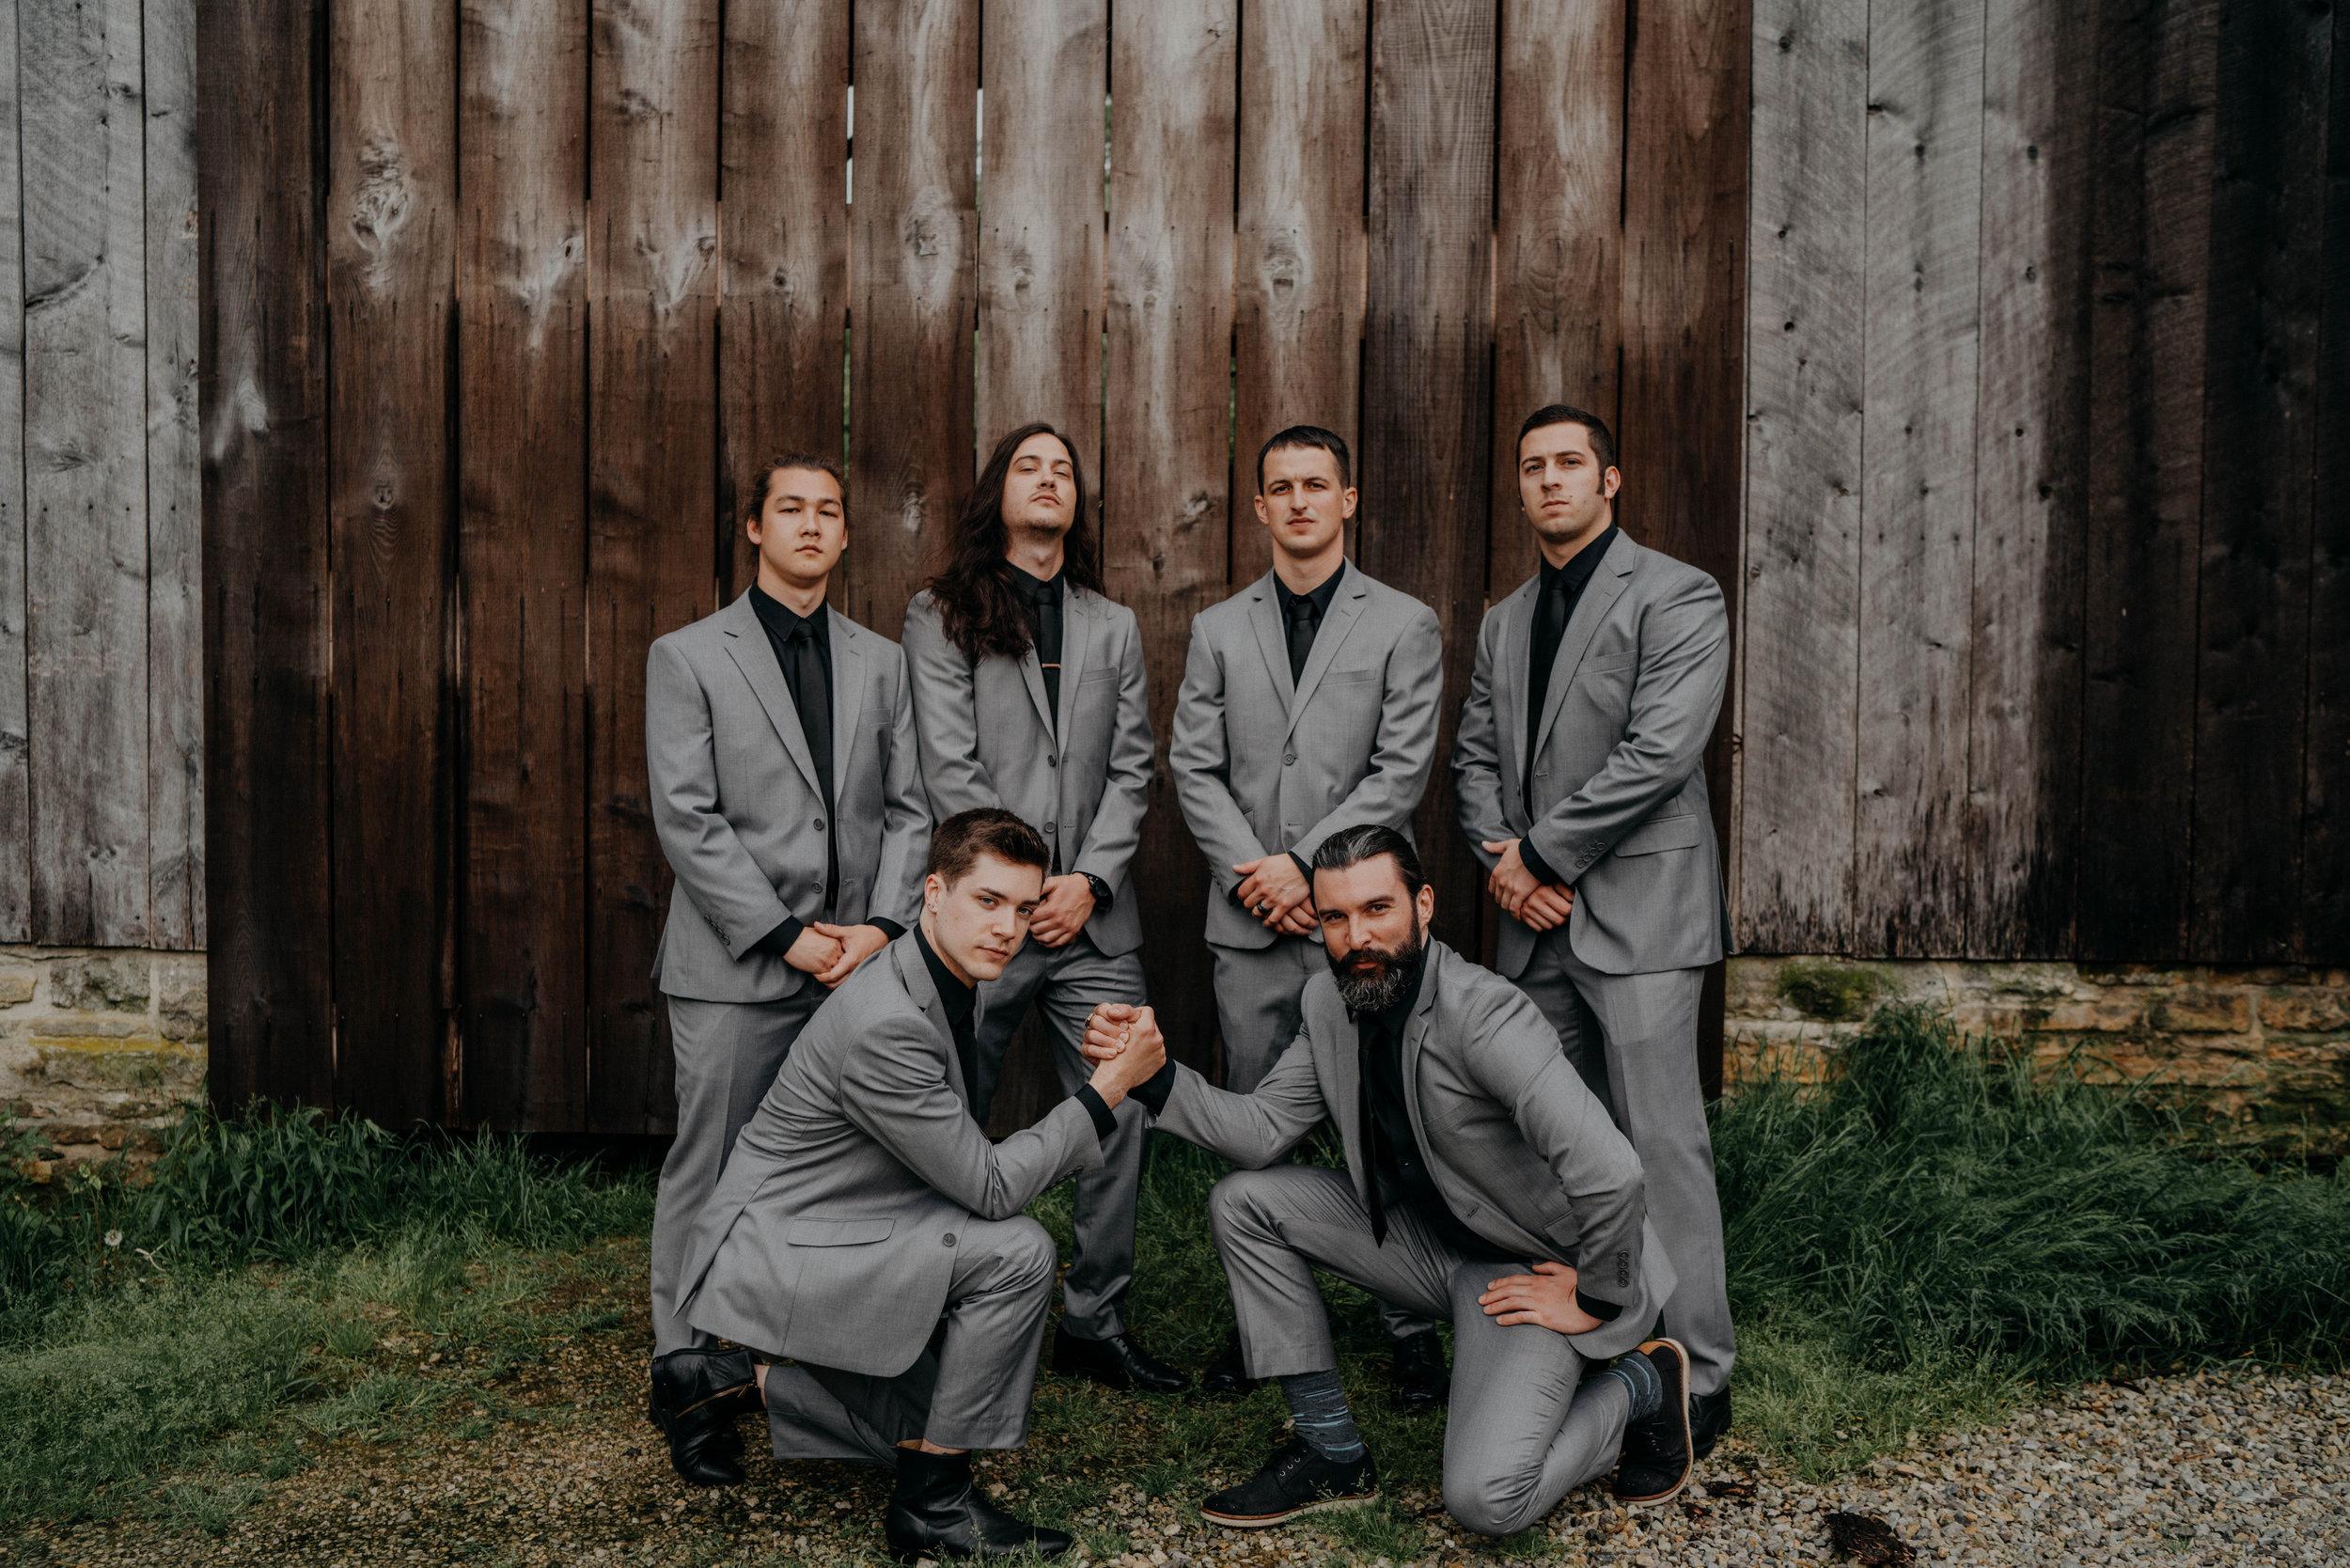 Columbus ohio wedding photographer canyon run ranch wedding grace e jones photography wedding photographer104.jpg